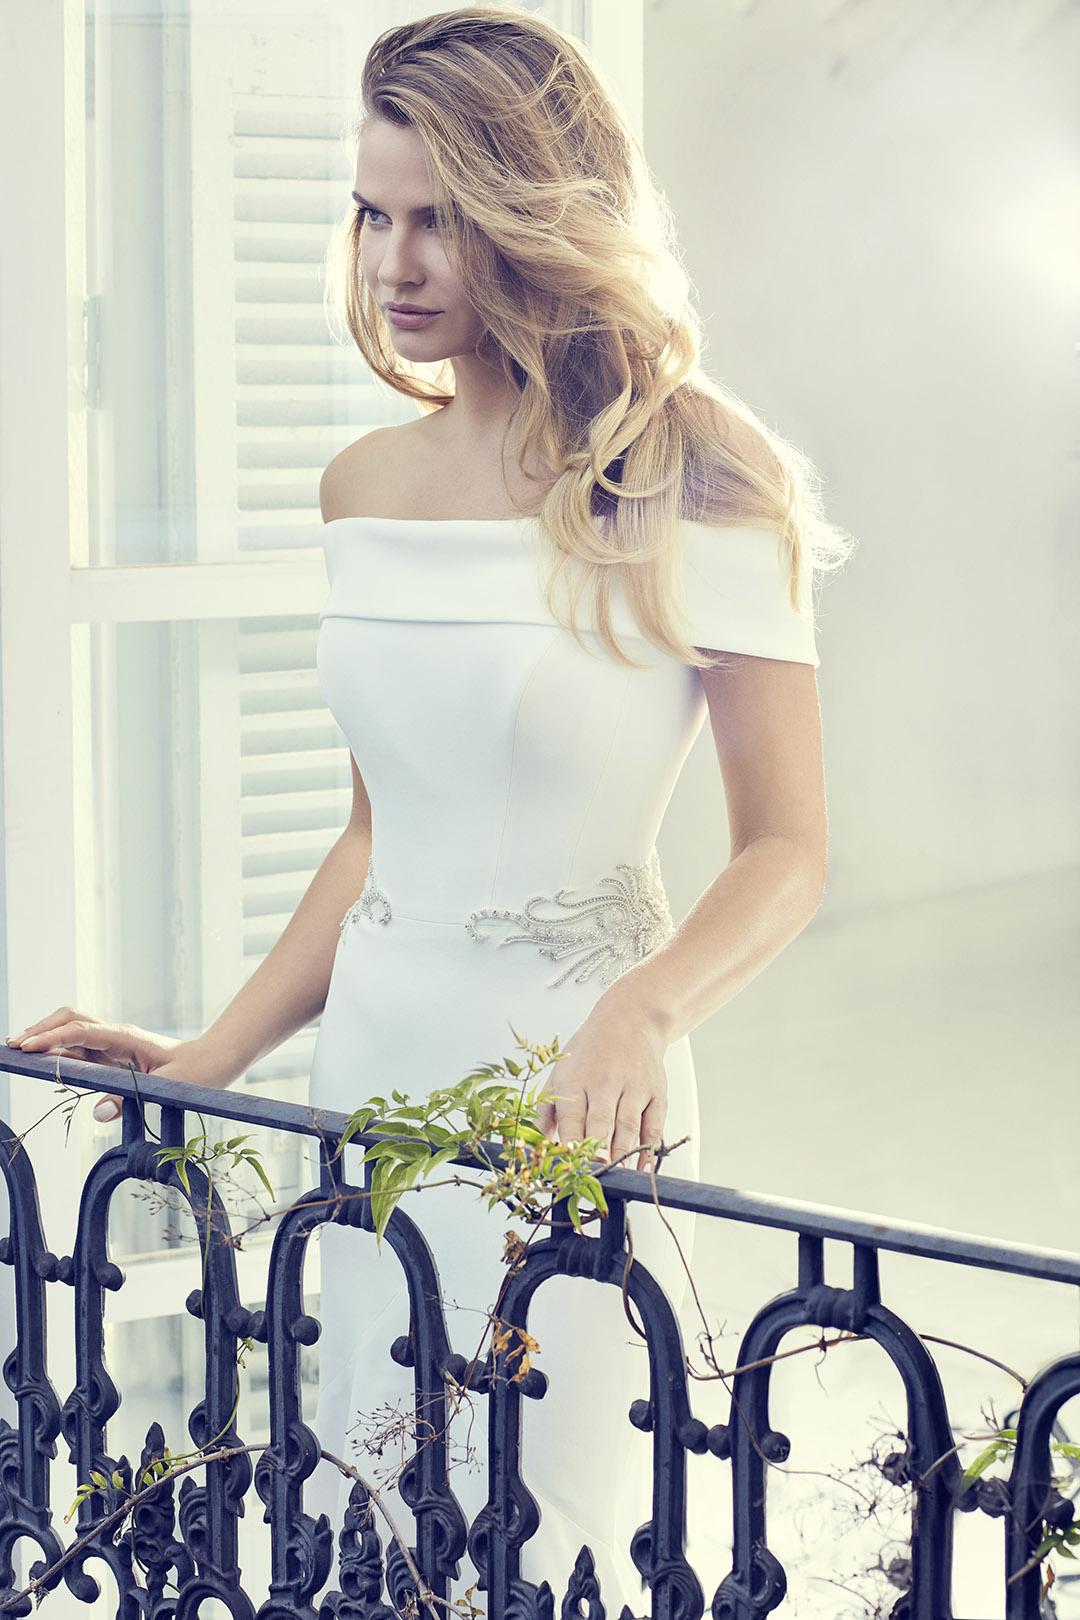 orianna1-wedding-dresses-uk-suzanne-neville-collection-hd-2019